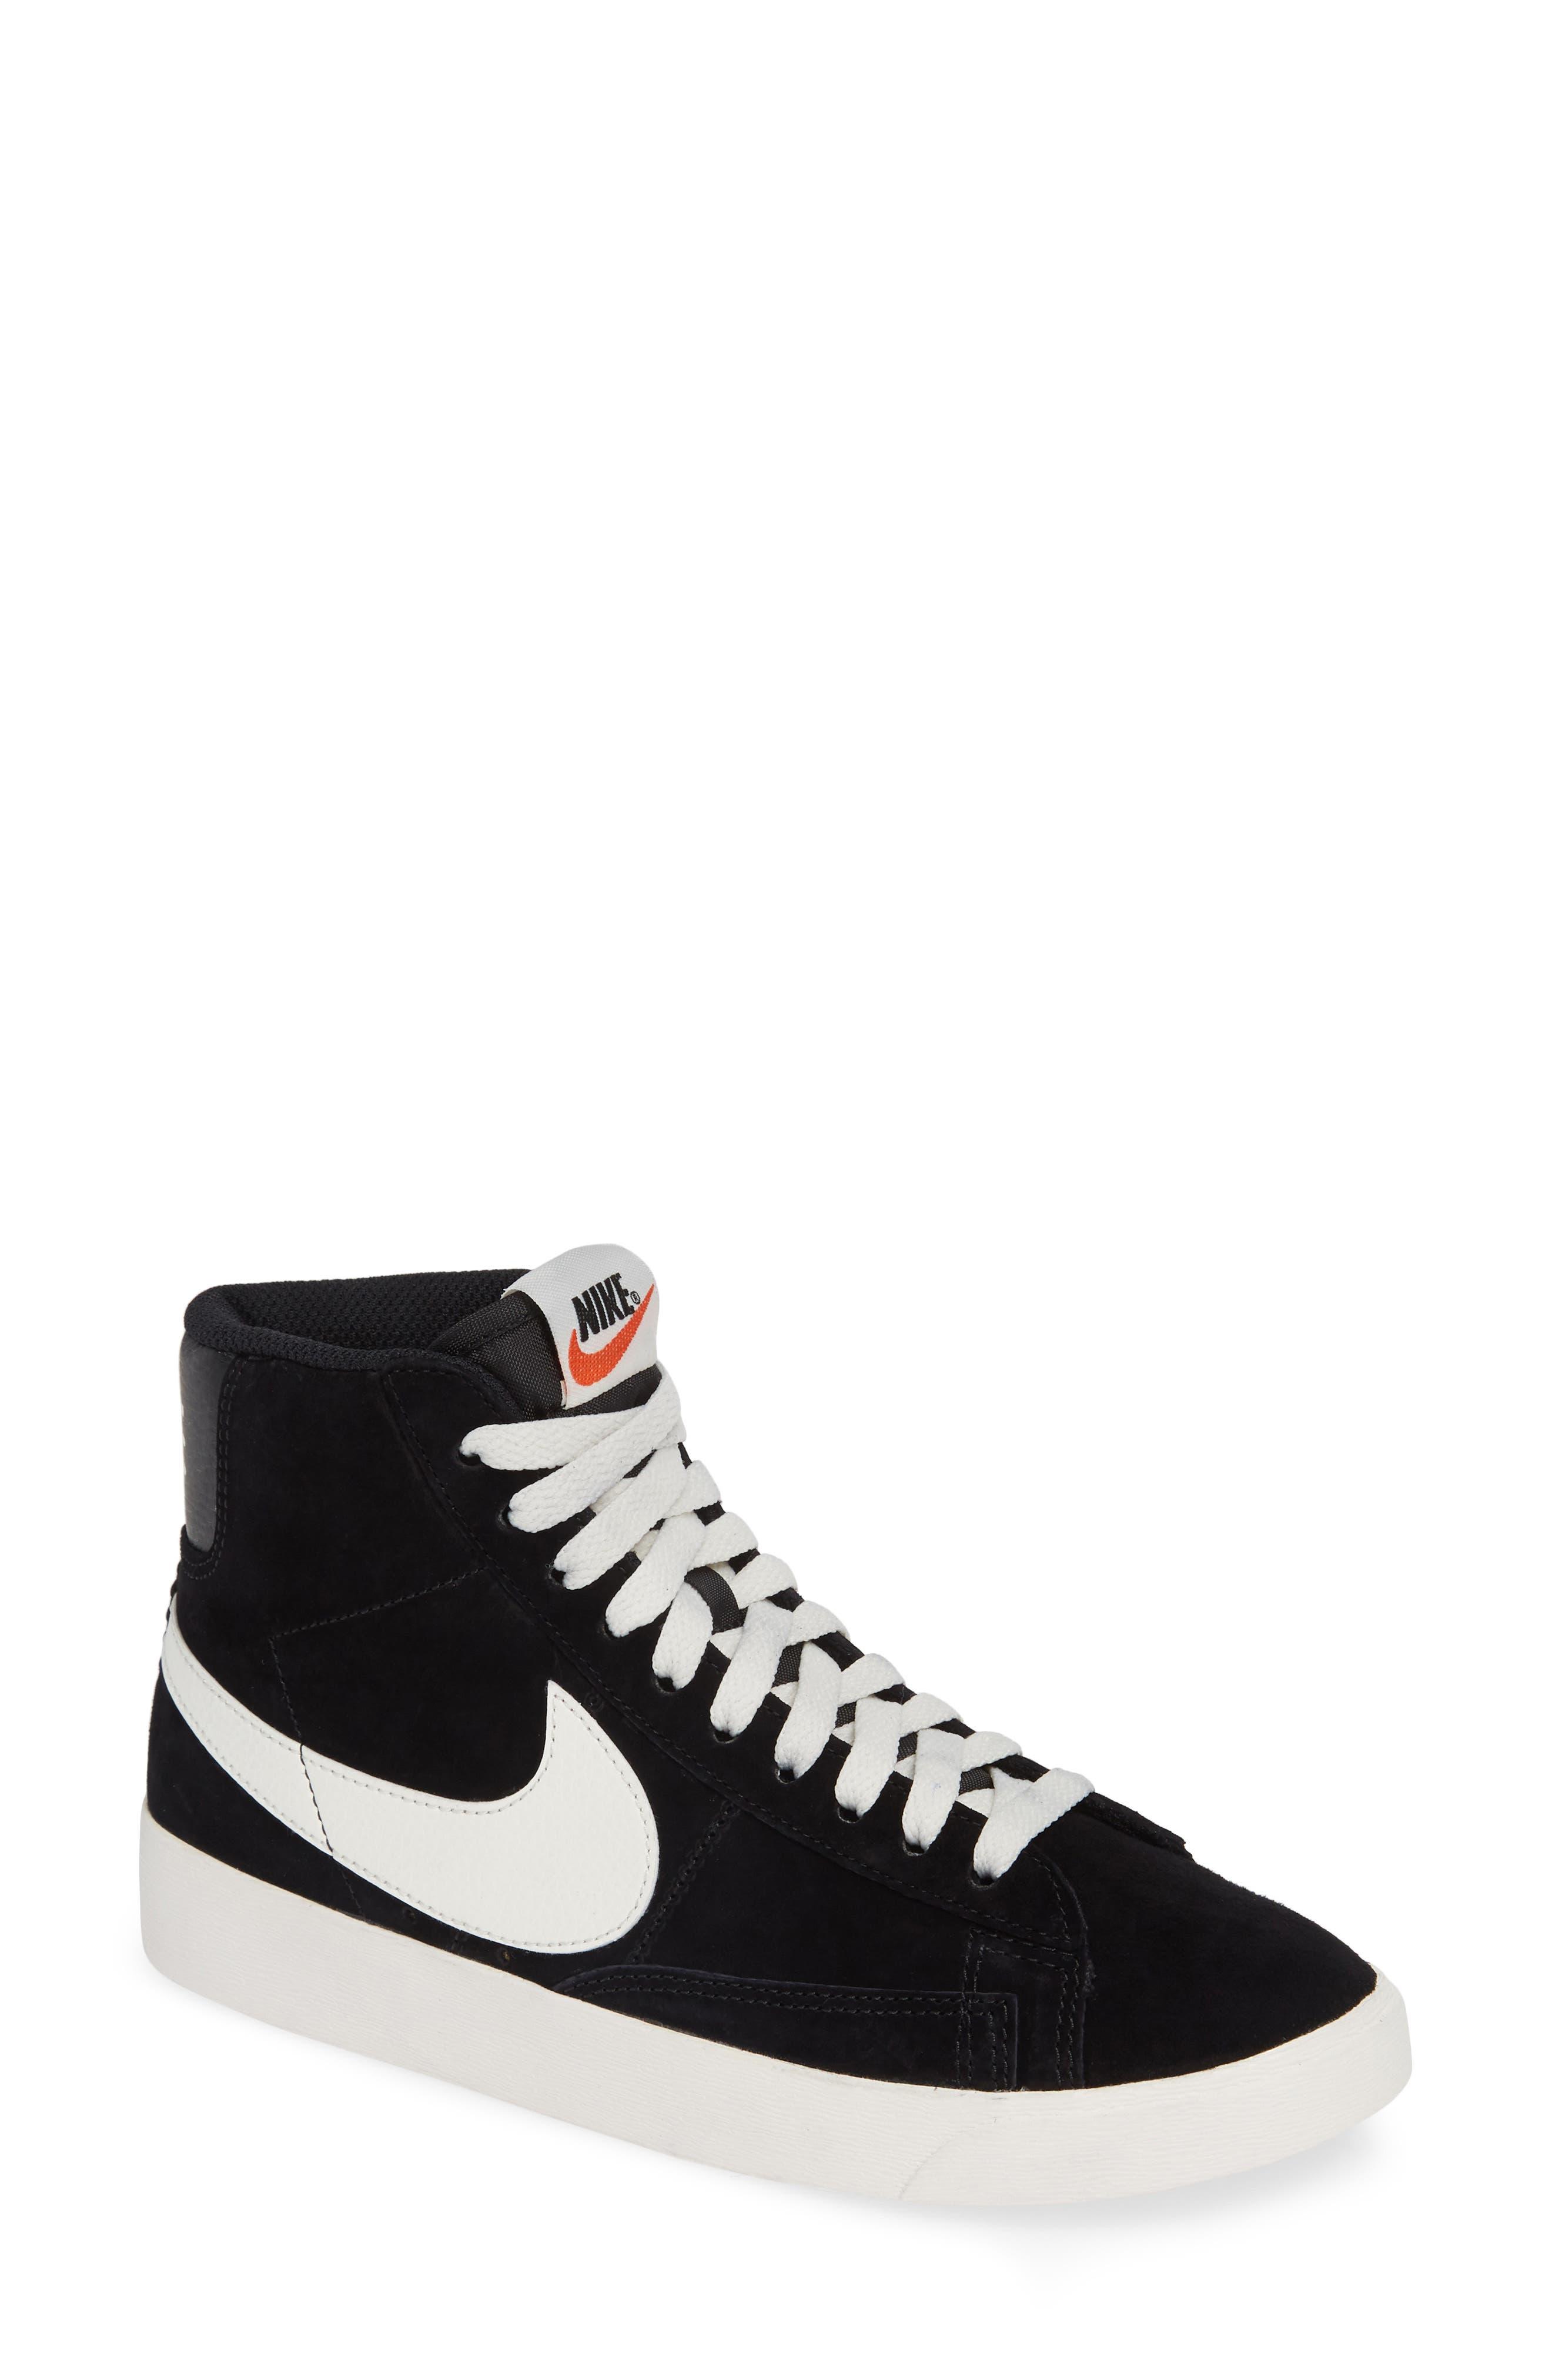 Blazer Mid Vintage Sneaker,                             Main thumbnail 1, color,                             BLACK/ SAIL